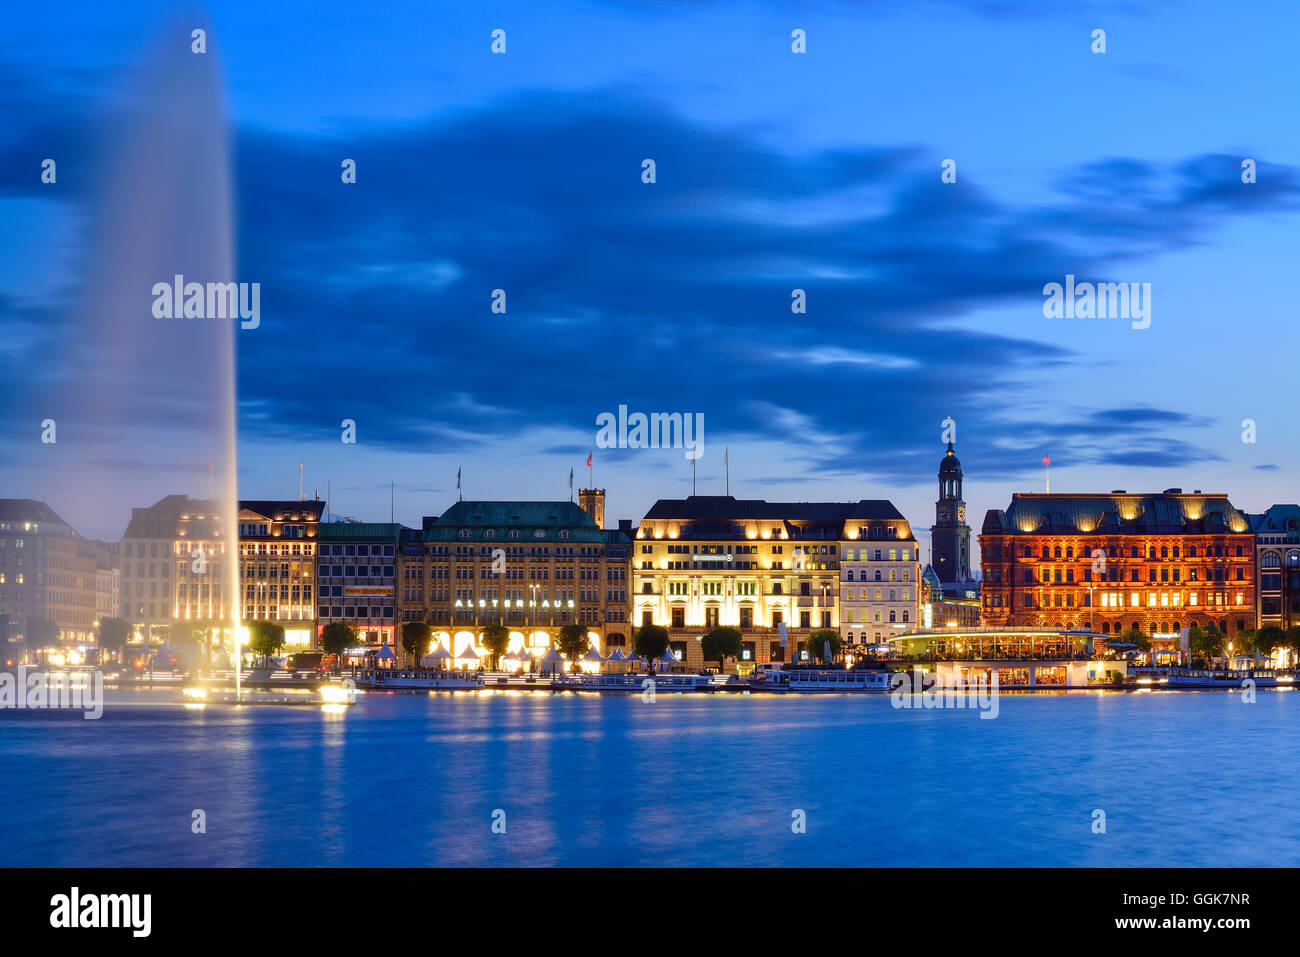 Binnenalster at night with fountain and illuminated church St. Michaelis, Binnenalster, Hamburg, Germany - Stock Image